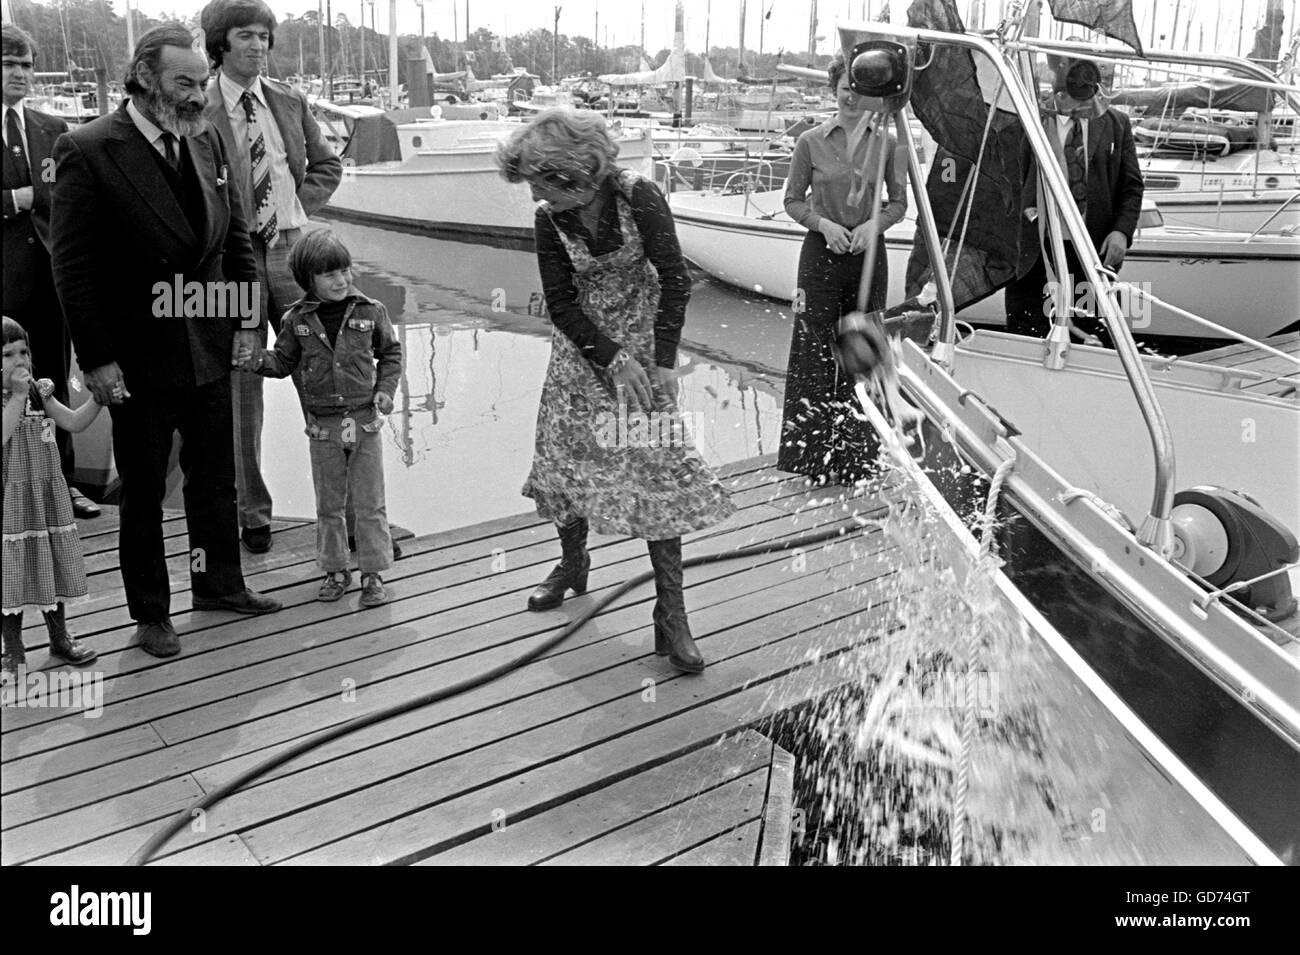 AJAXNETPHOTO. 1976. SWANICK, ENGLAND. (L-R) ANGUS PRIMROSE (WITH BEARD_ LOOKIS ON WHILE HIS WIFE MURLO NAMES DEMON - Stock Image